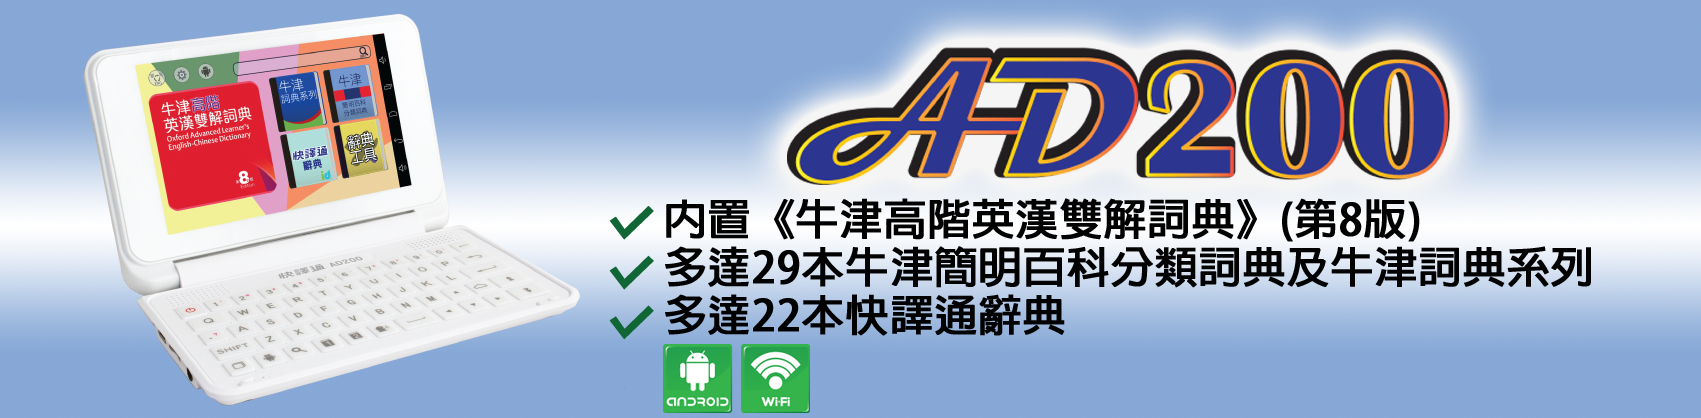 AD200-1